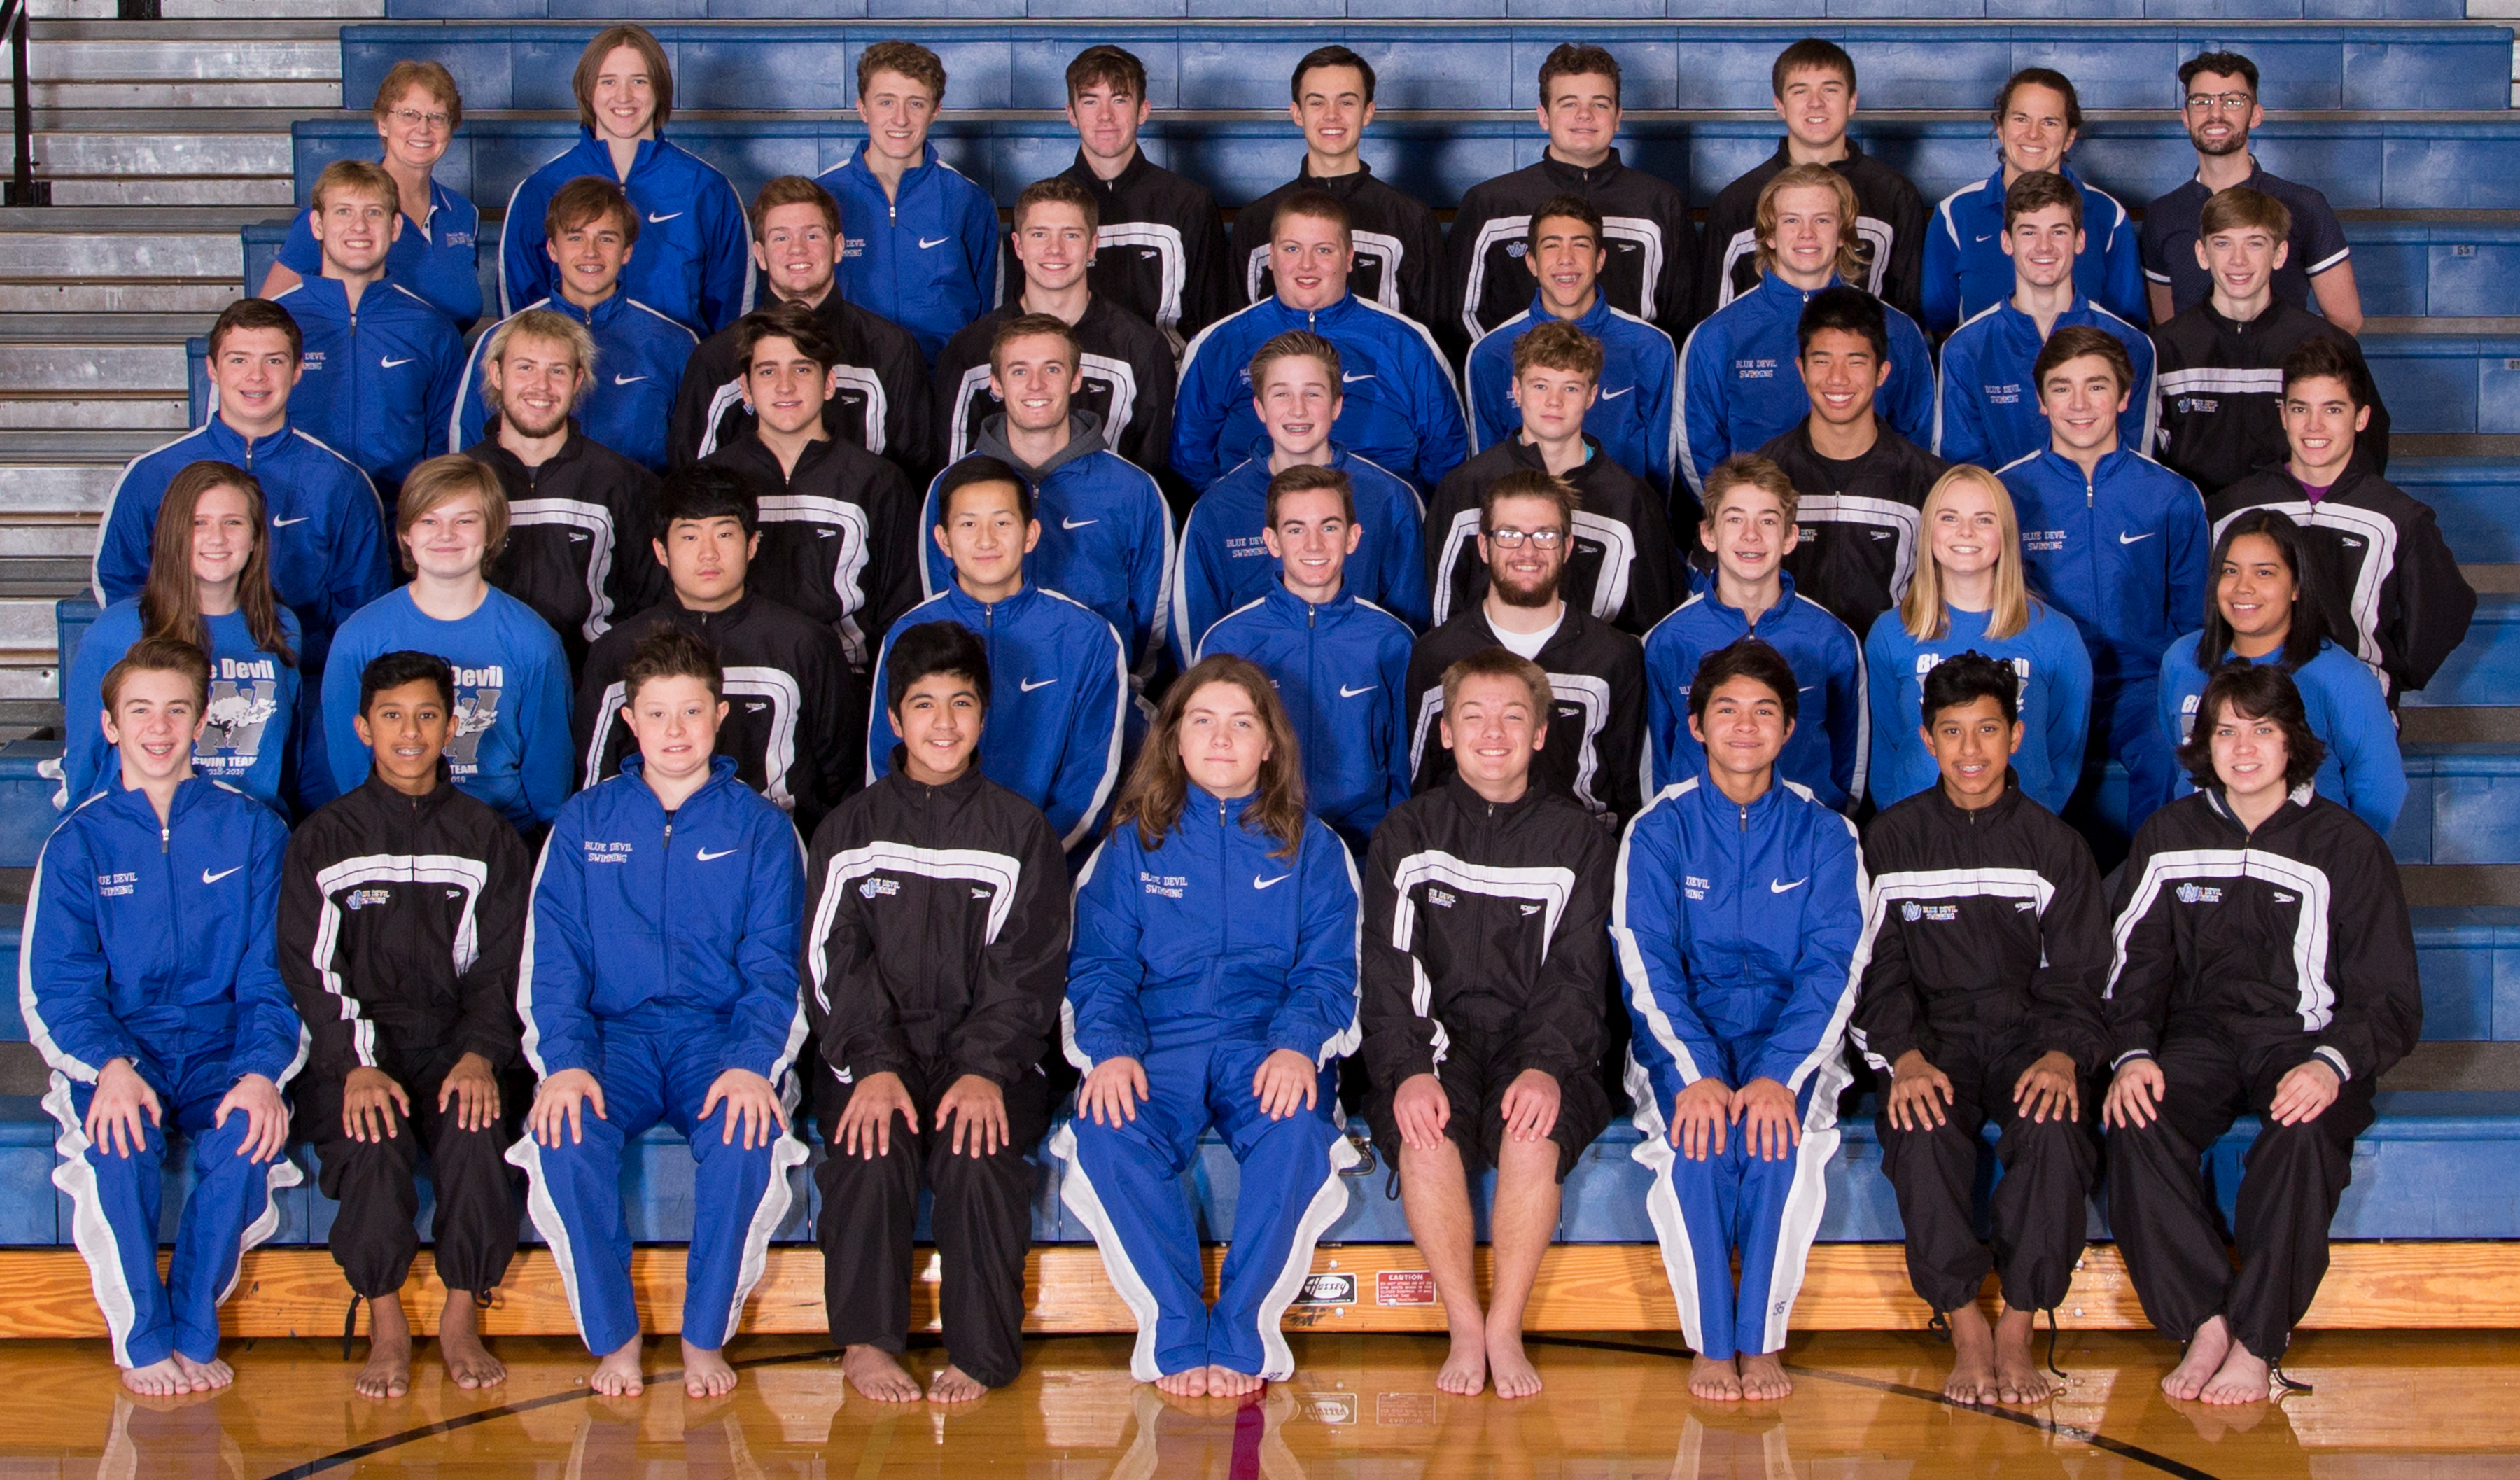 images/athletics/Swimming/Swim_Boys_Team_2018-19.jpg